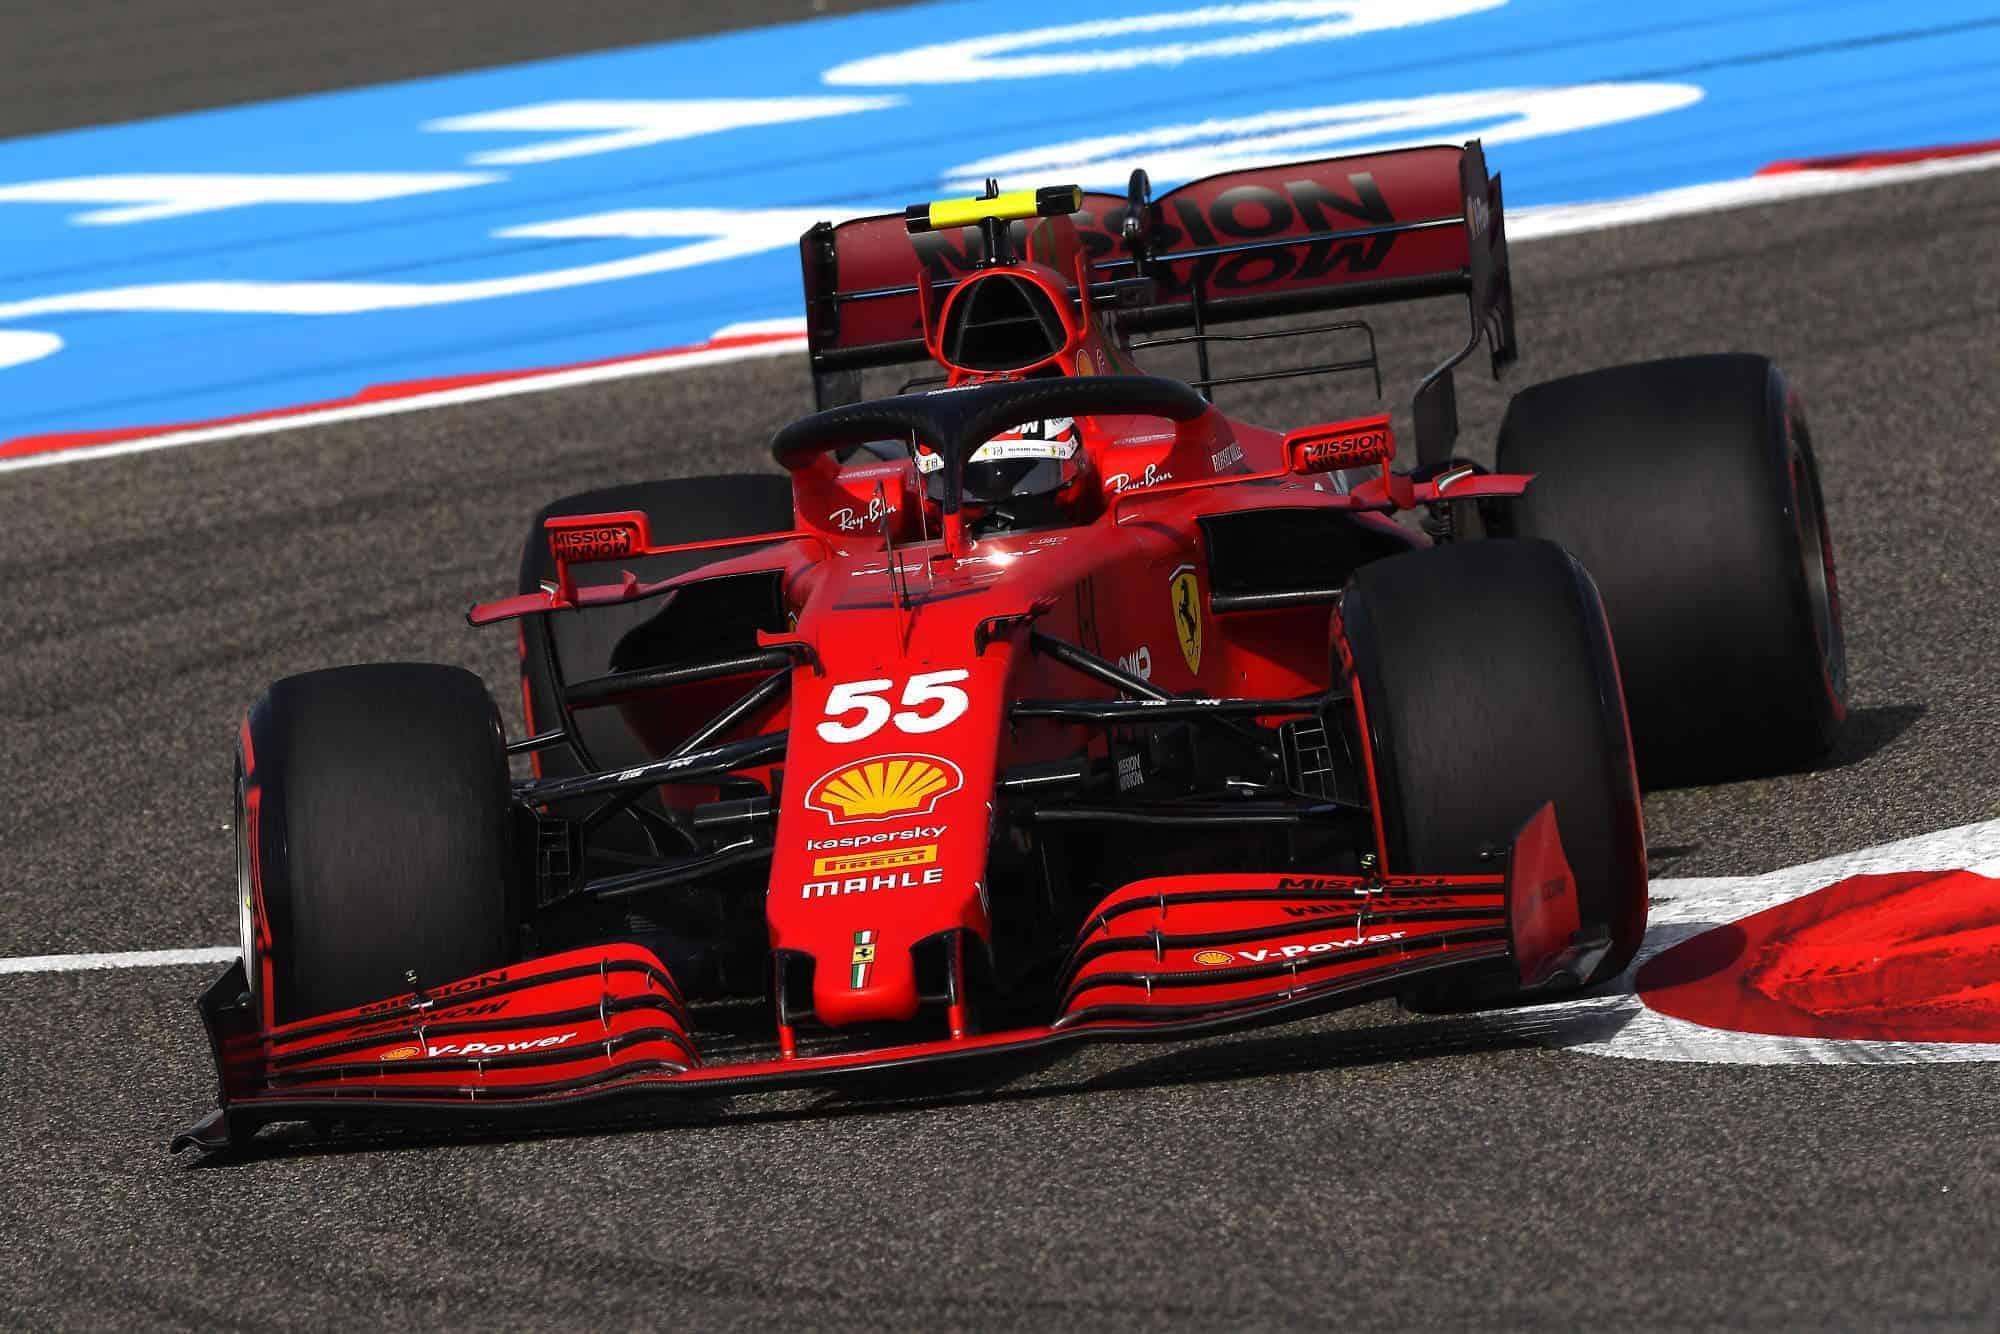 2021 Bahrain GP Sainz Ferrari SF21 soft C4 Pirelli Turn 10 Photo Ferrari